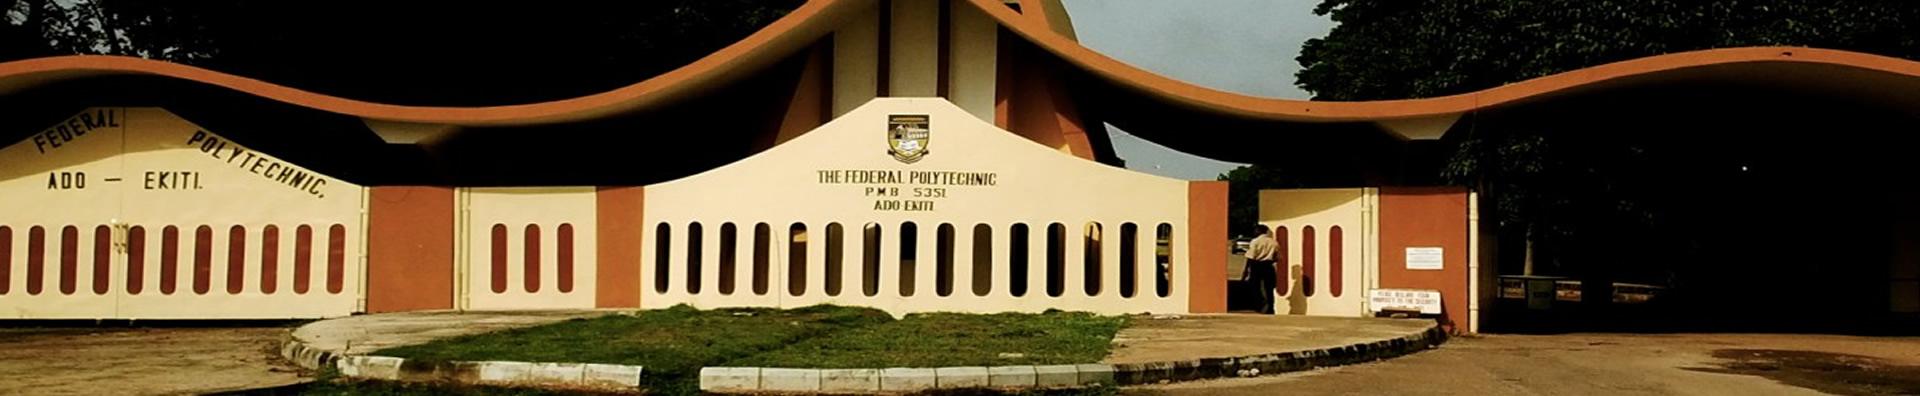 Federal Polytechnic Ado-Ekiti commences 2020/2021 Academic Session